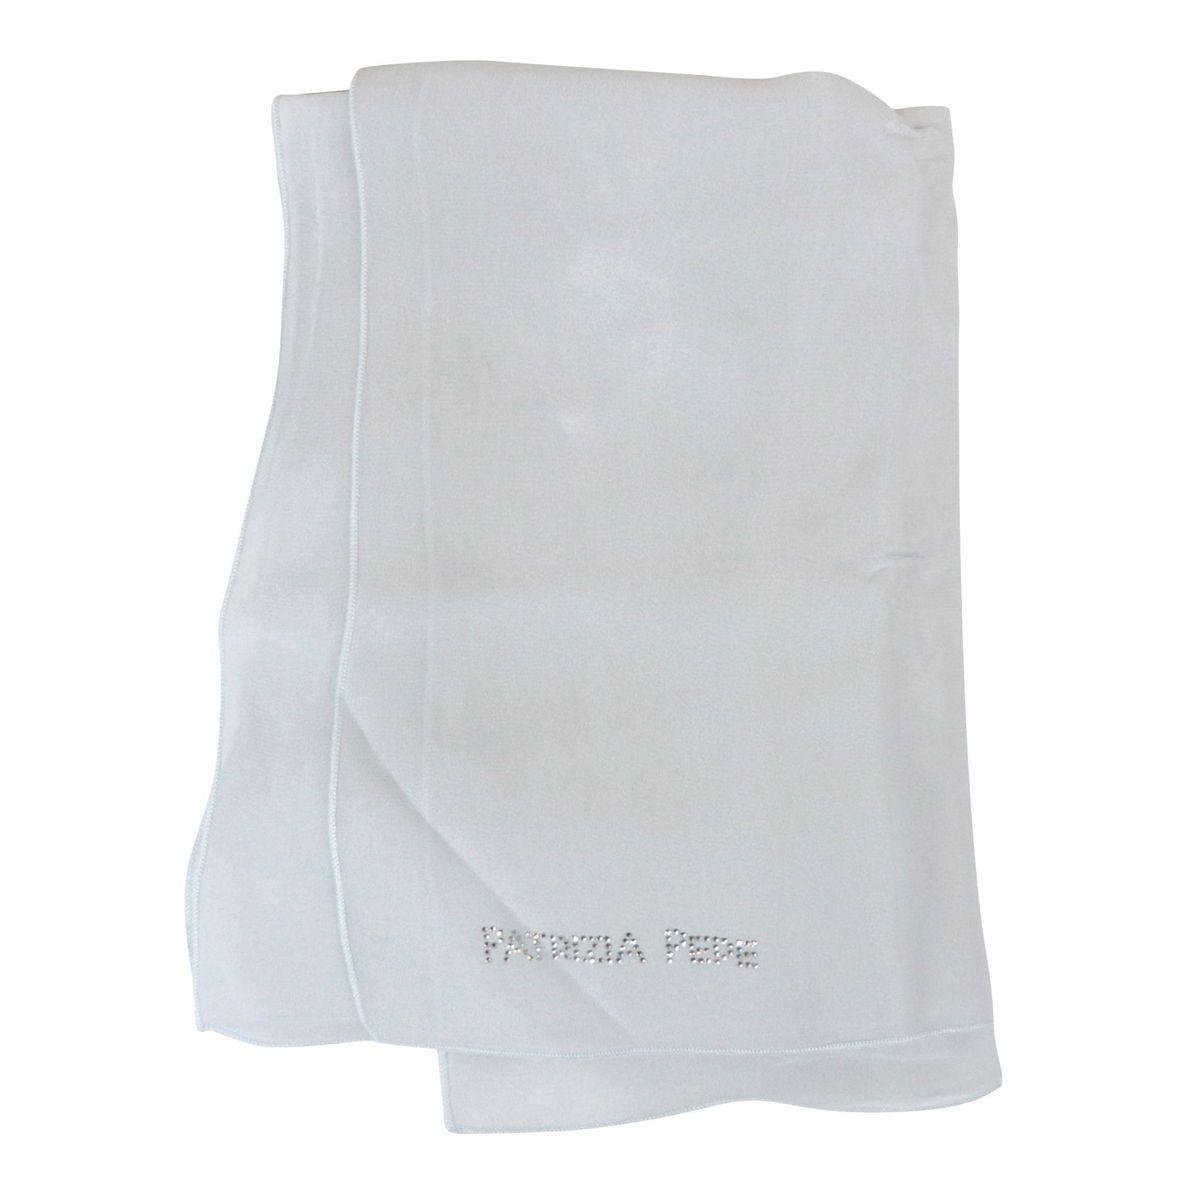 Viscose scarf with rhinestone logo Ivory gray Patrizia Pepe